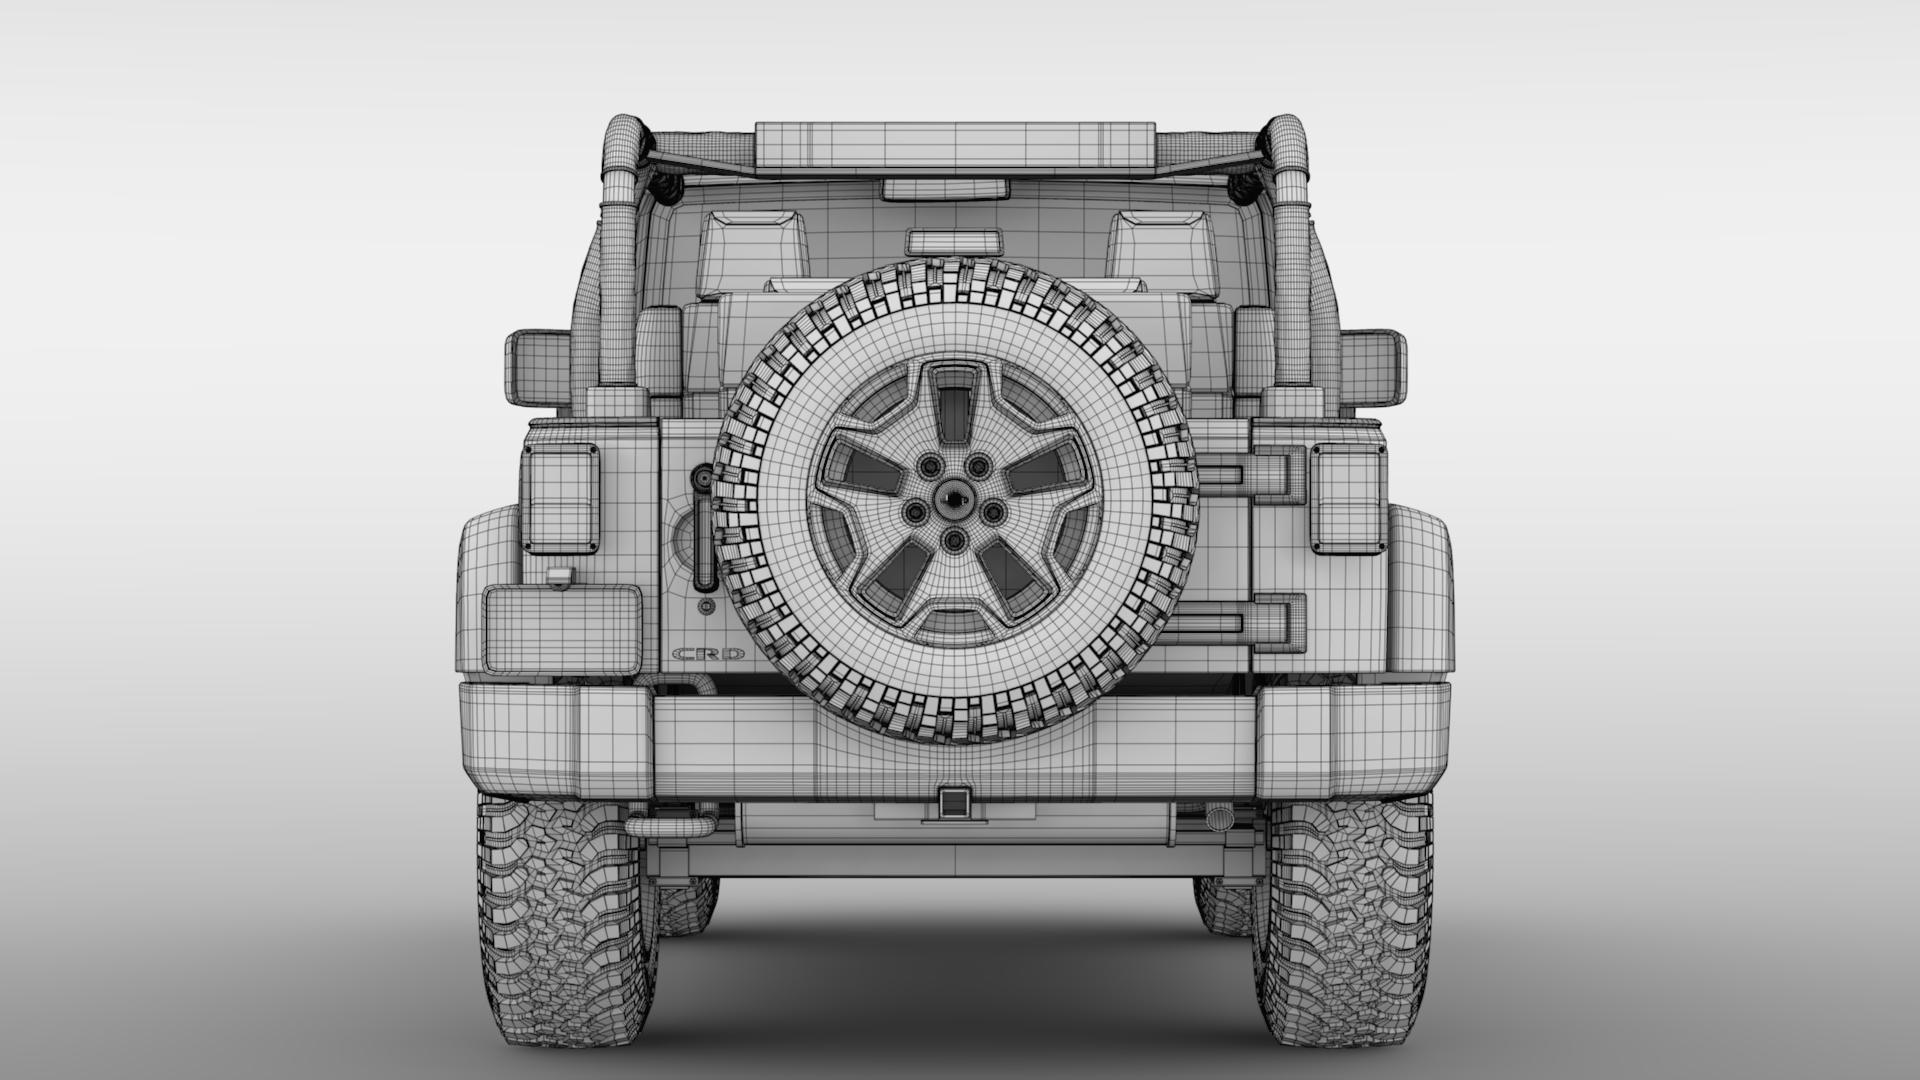 jeep wrangler willys wheeler jk 2017 3d model max fbx c4d lwo ma mb hrc xsi obj 276811